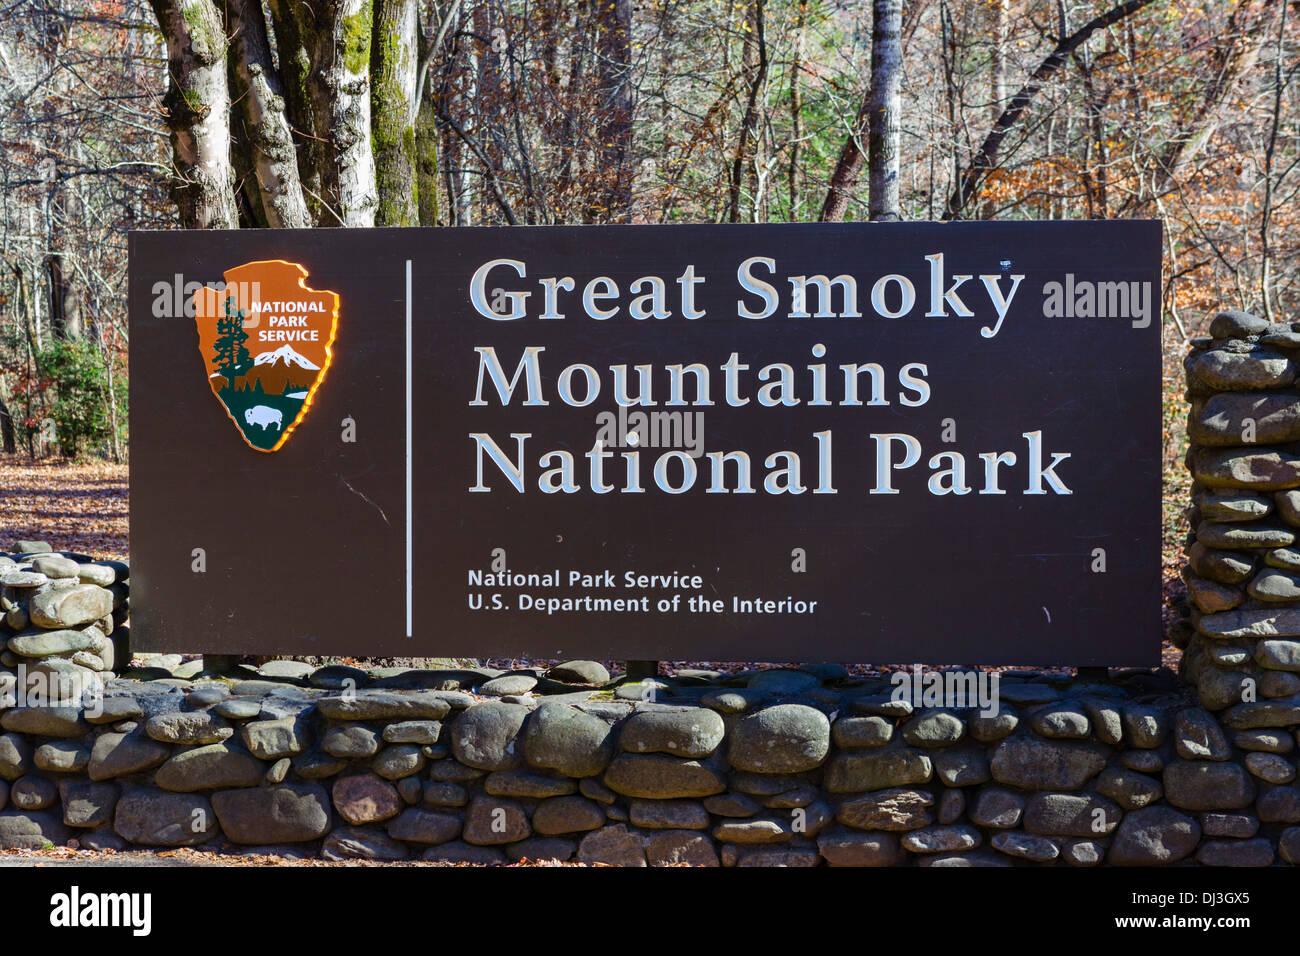 Entrance sign to Great Smoky Mountains National Park, near Cherokee, North Carolina, USA - Stock Image